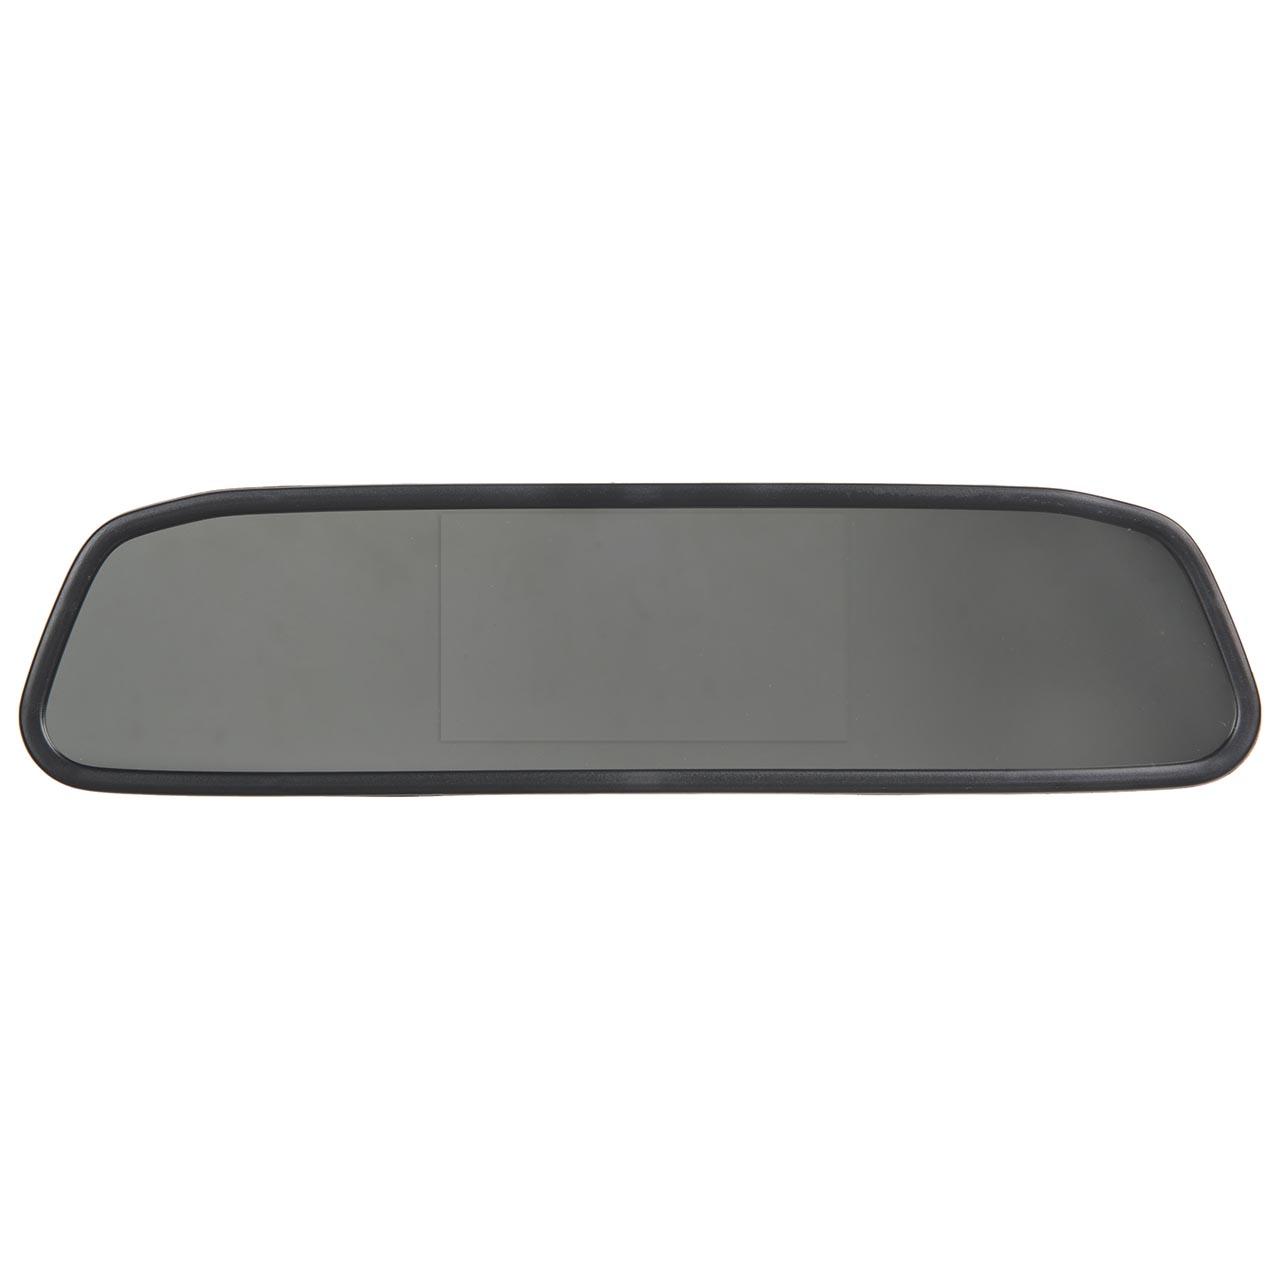 آینه و مانیتور دنده عقب خودرو مدل Maxim NKG